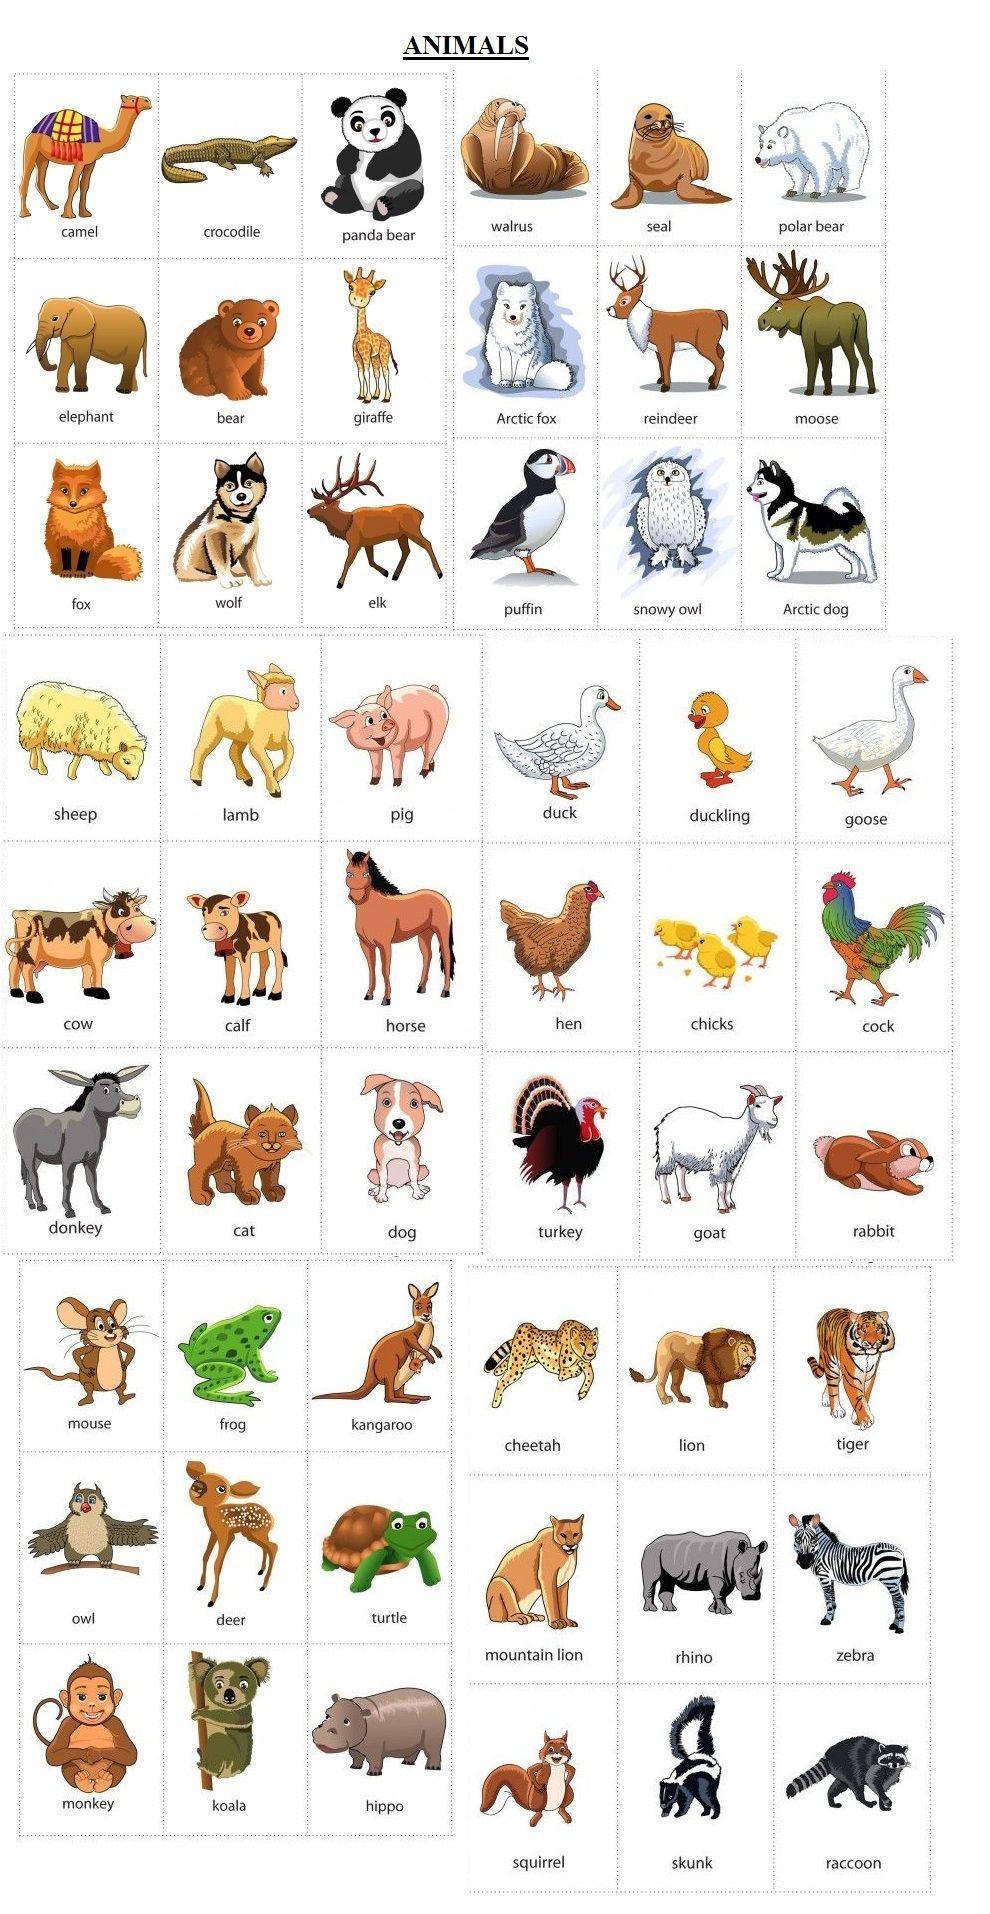 English Vocabulary Animales En Ingles Ingles Para Preescolar Ingles Basico Para Ninos